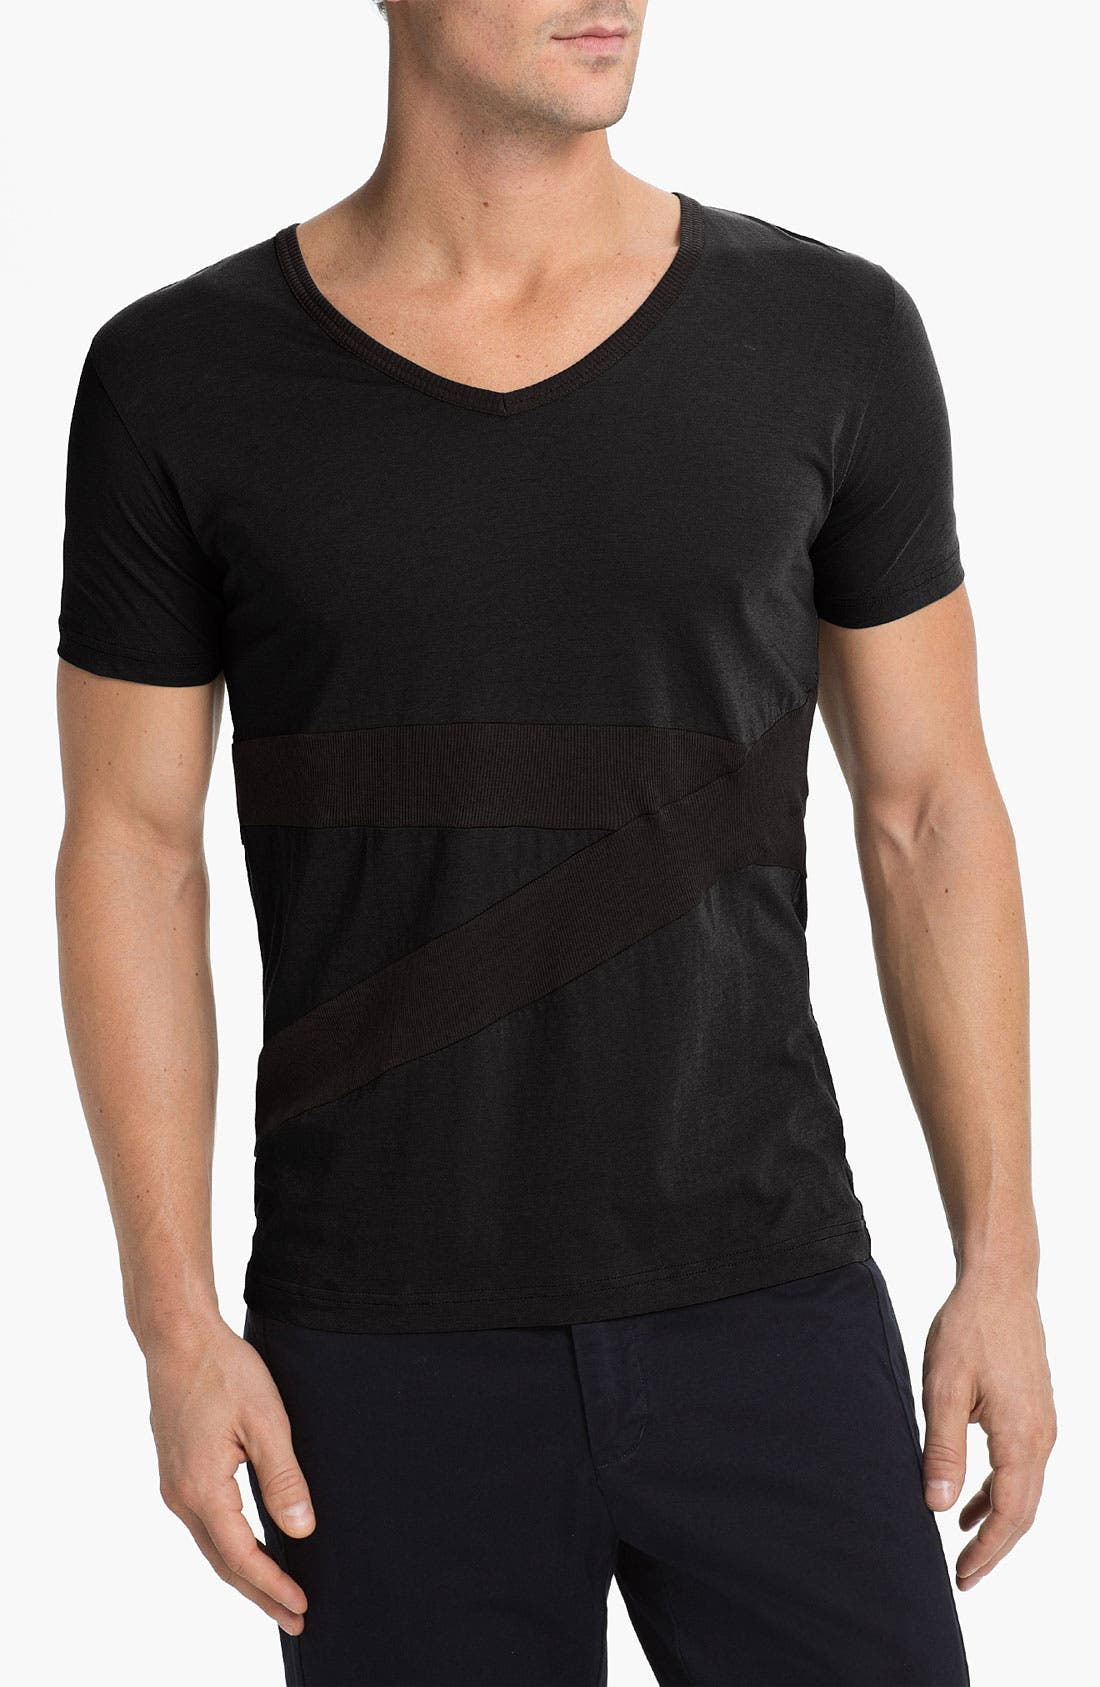 Alternate Image 1 Selected - adidas SLVR Banded T-Shirt